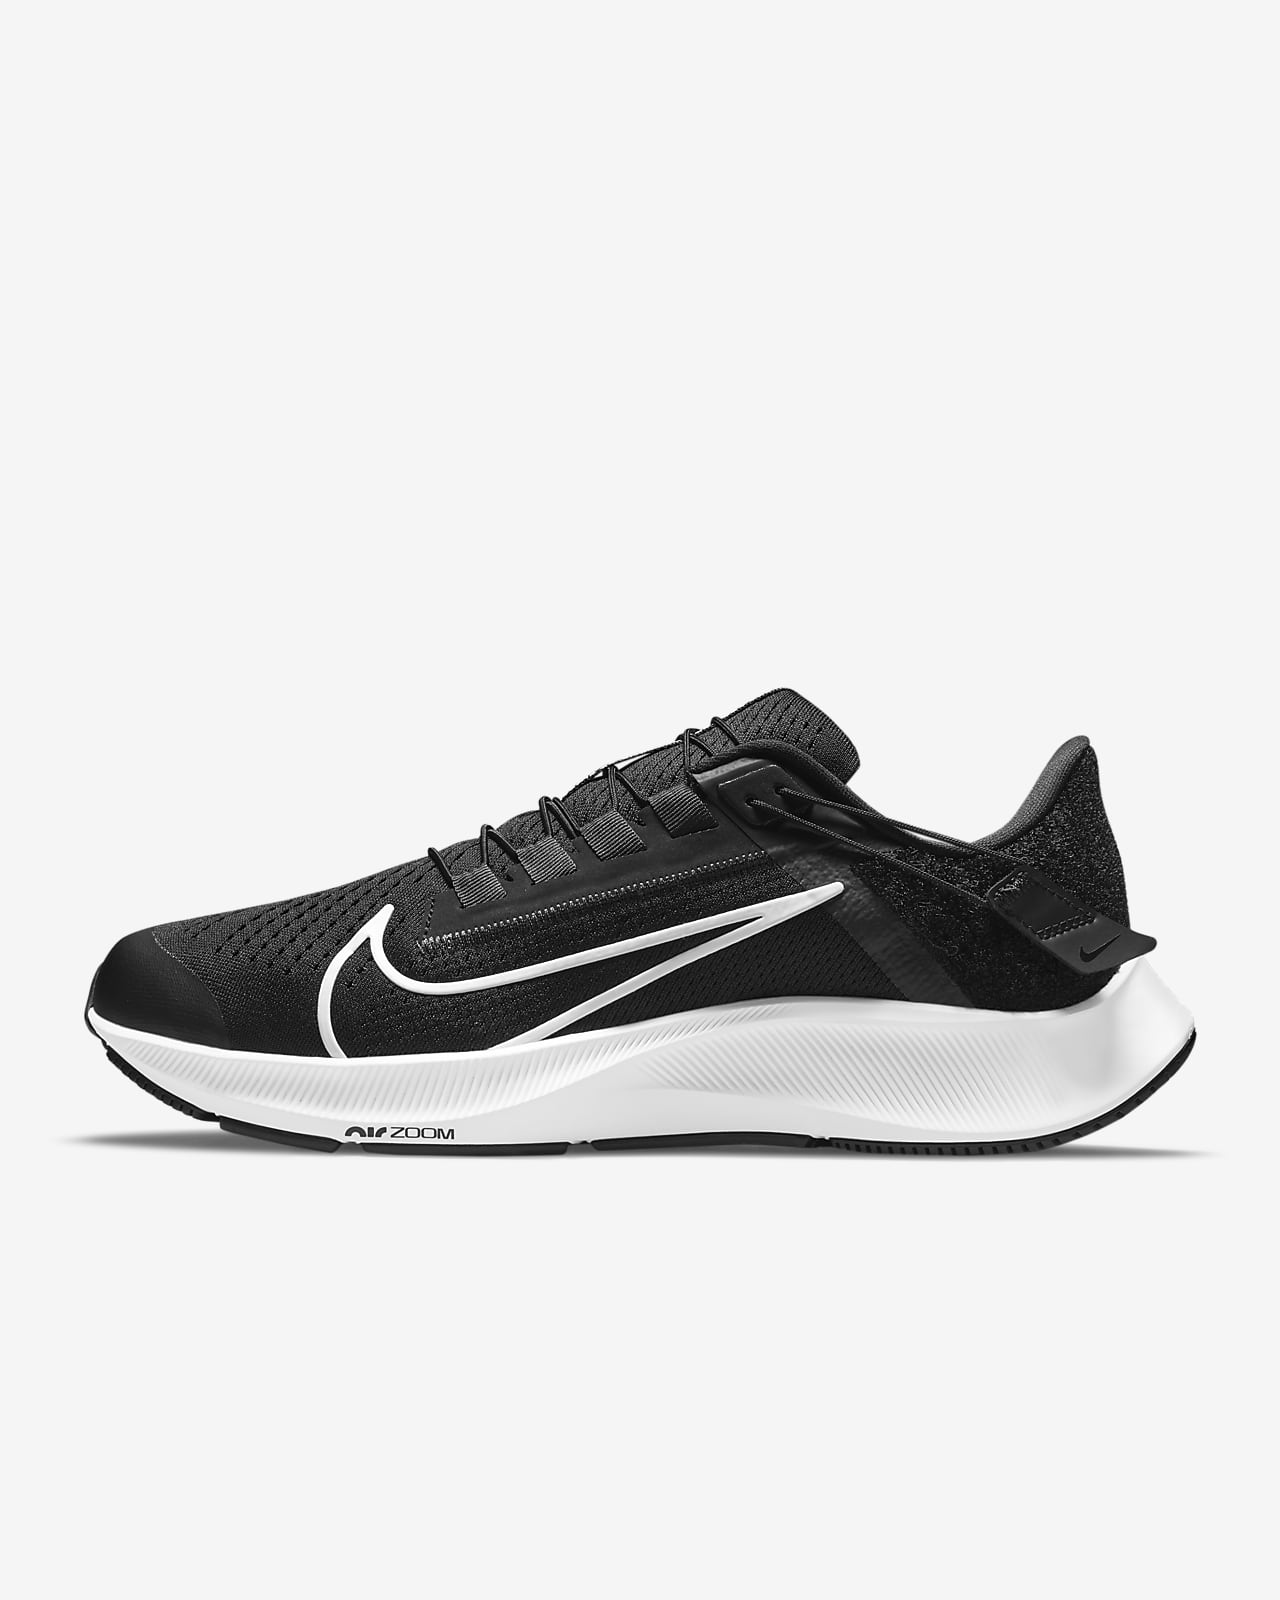 Sapatilhas de running Nike Air Zoom Pegasus 38 FlyEase para homem